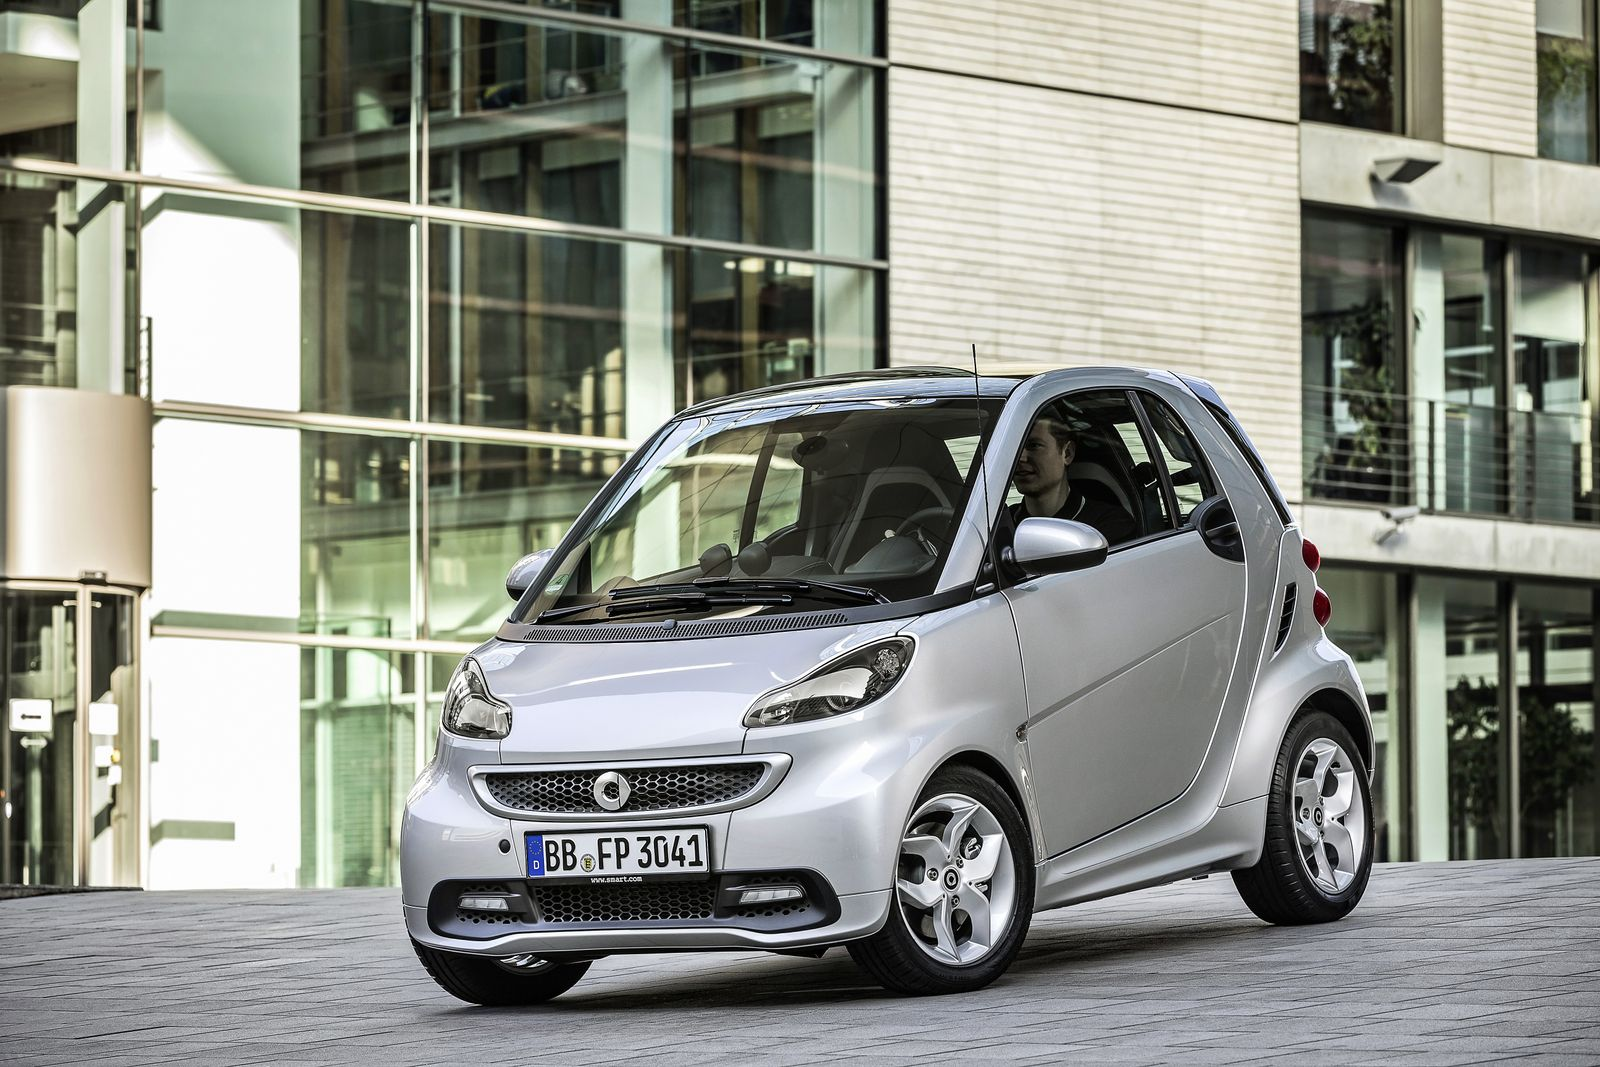 smart fortwo citybeam (2013) / Daimler